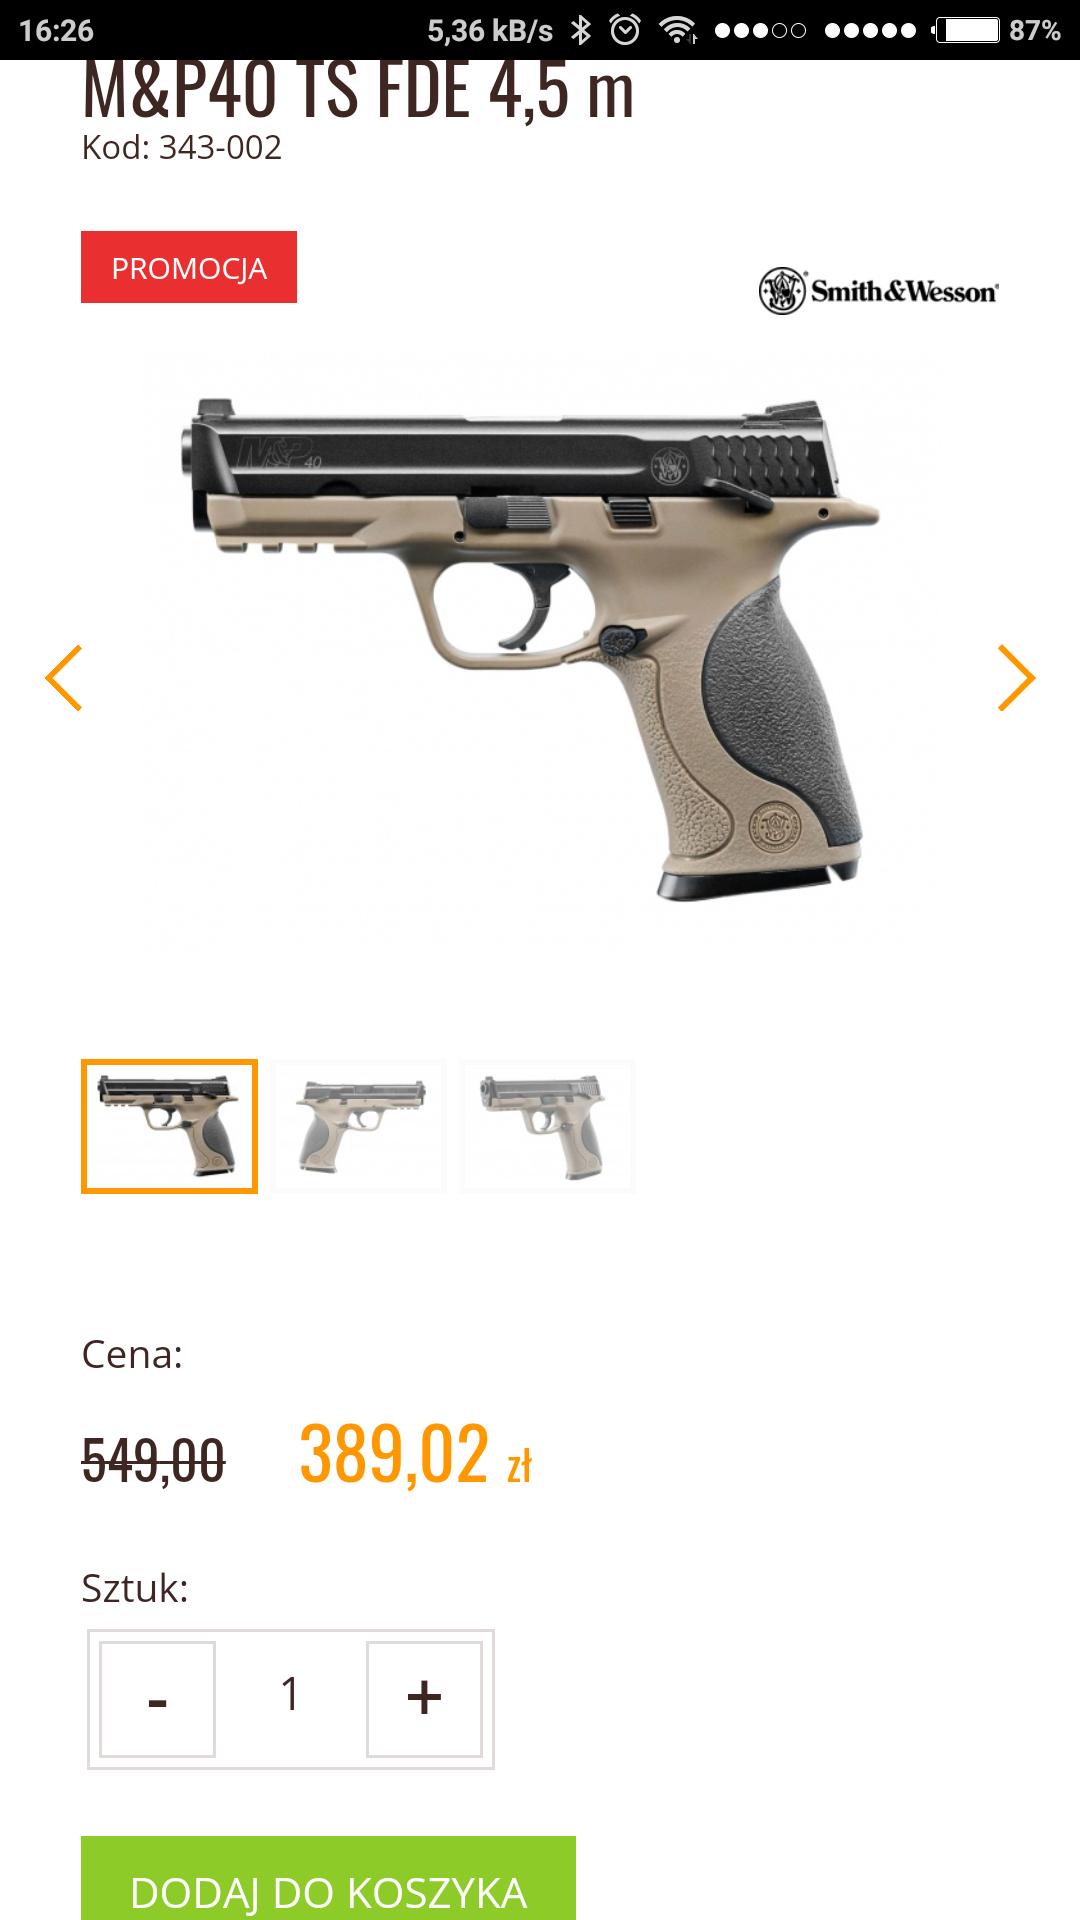 Pistolet wiatrówka Smith&Wesson M&P40 TS FDE 4,5 m